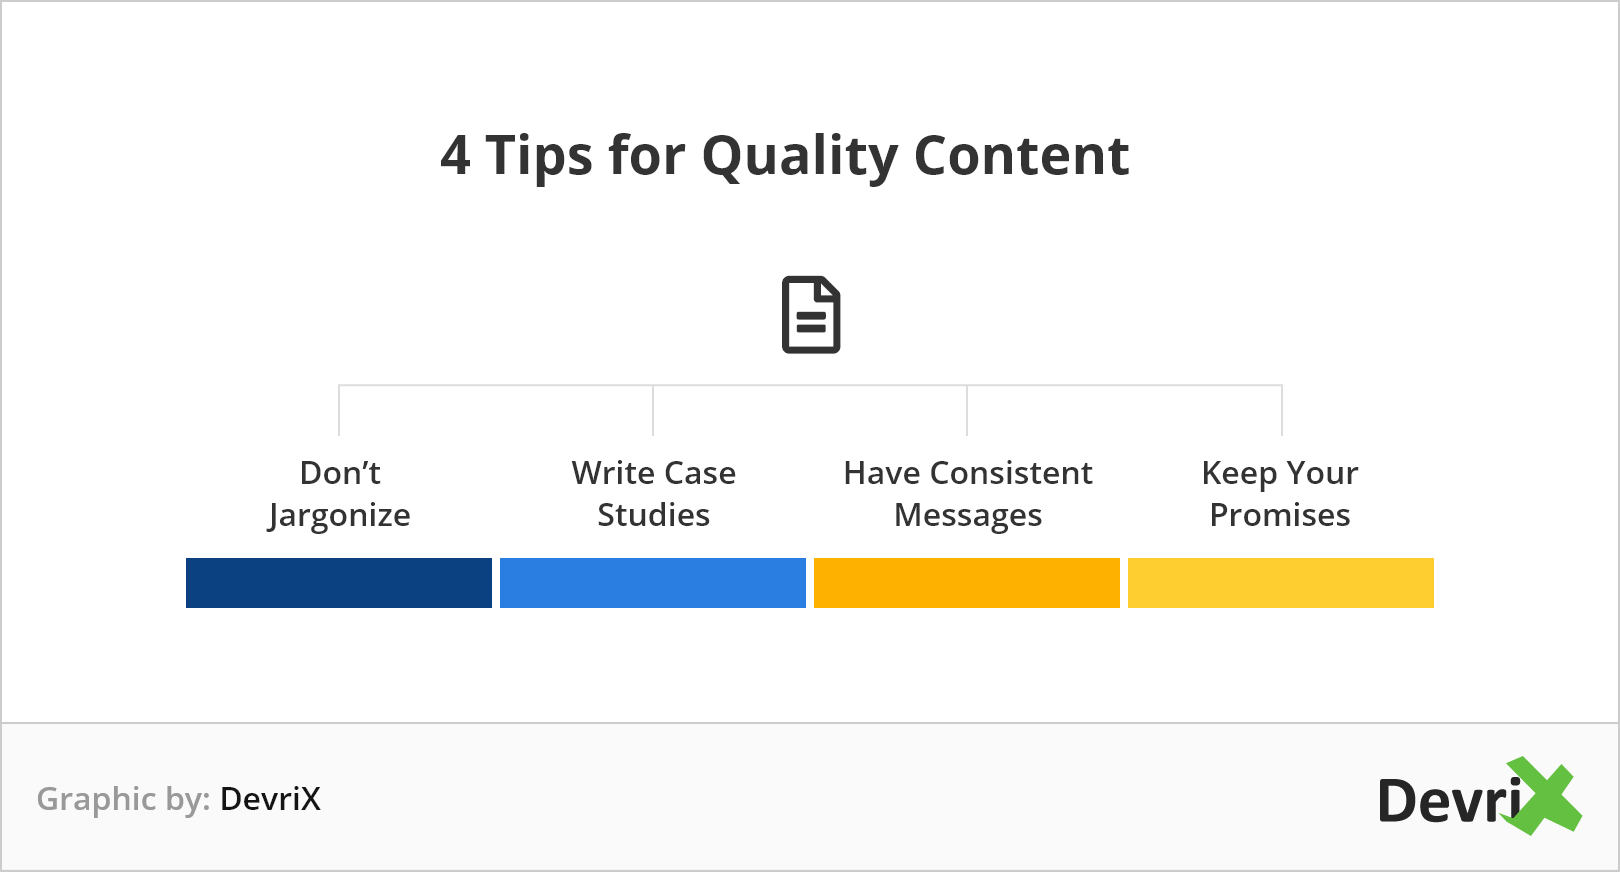 DevriX 4 tips for quality content